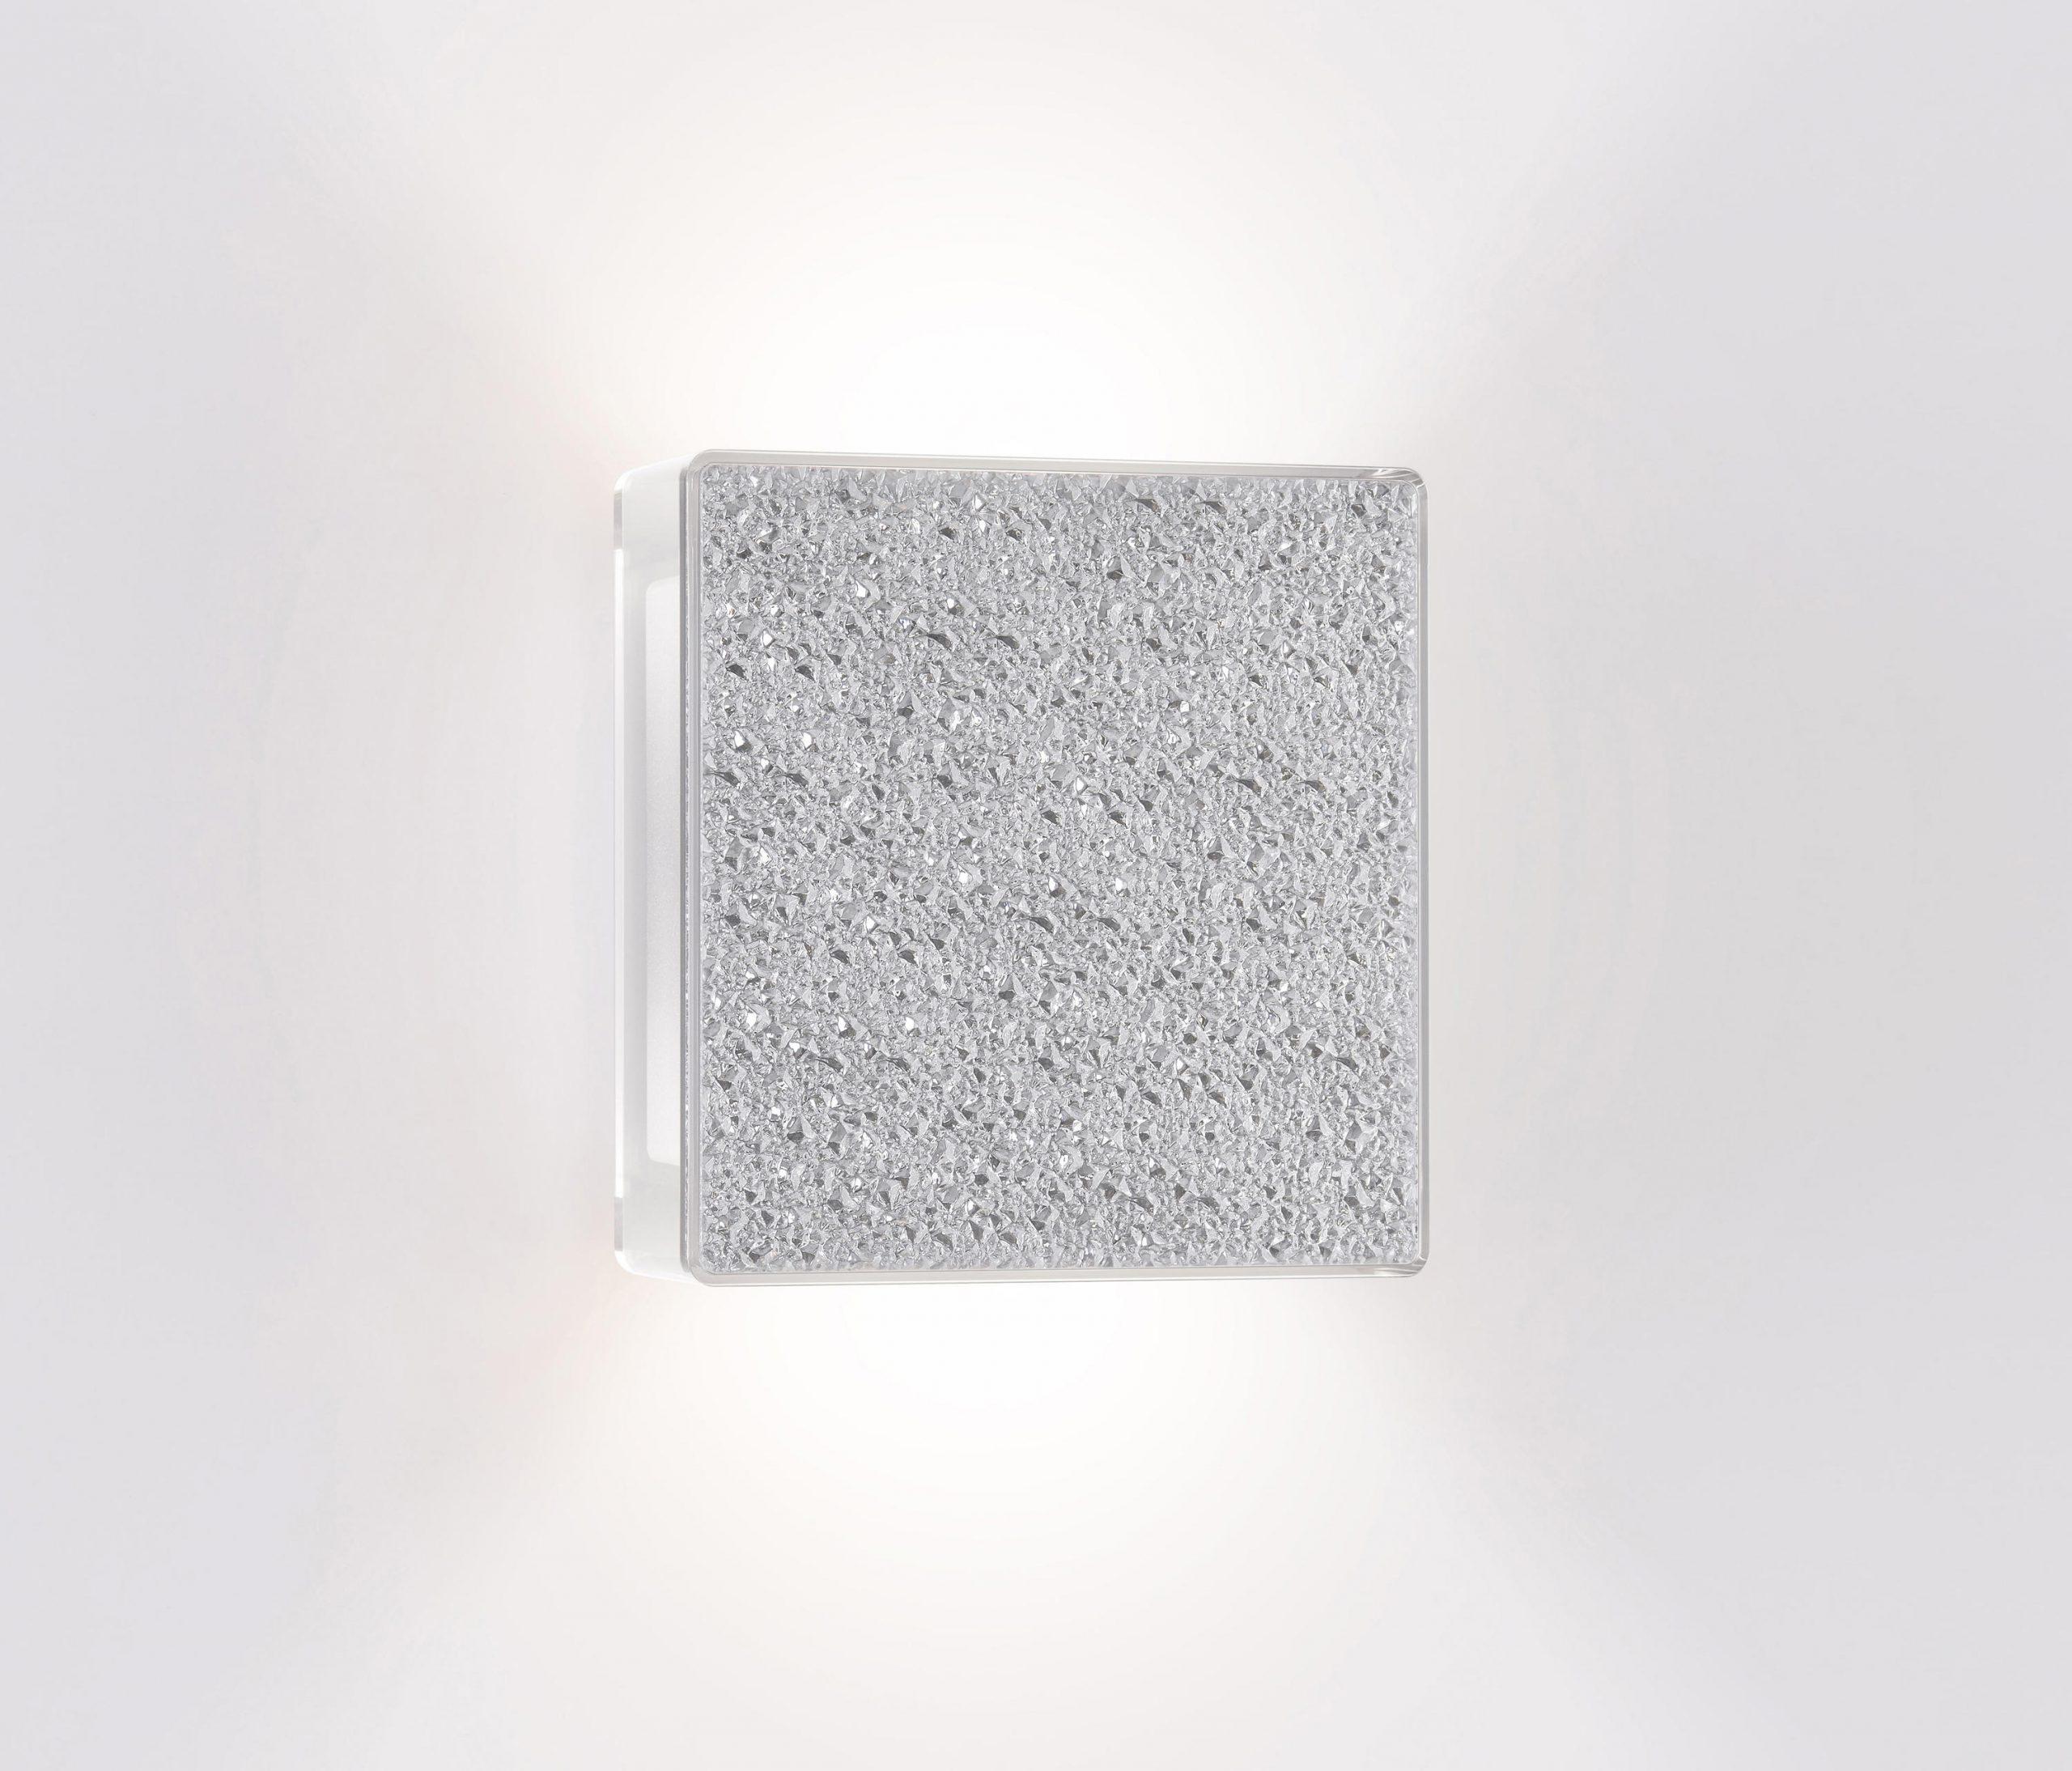 app-wall-eiskristall-b